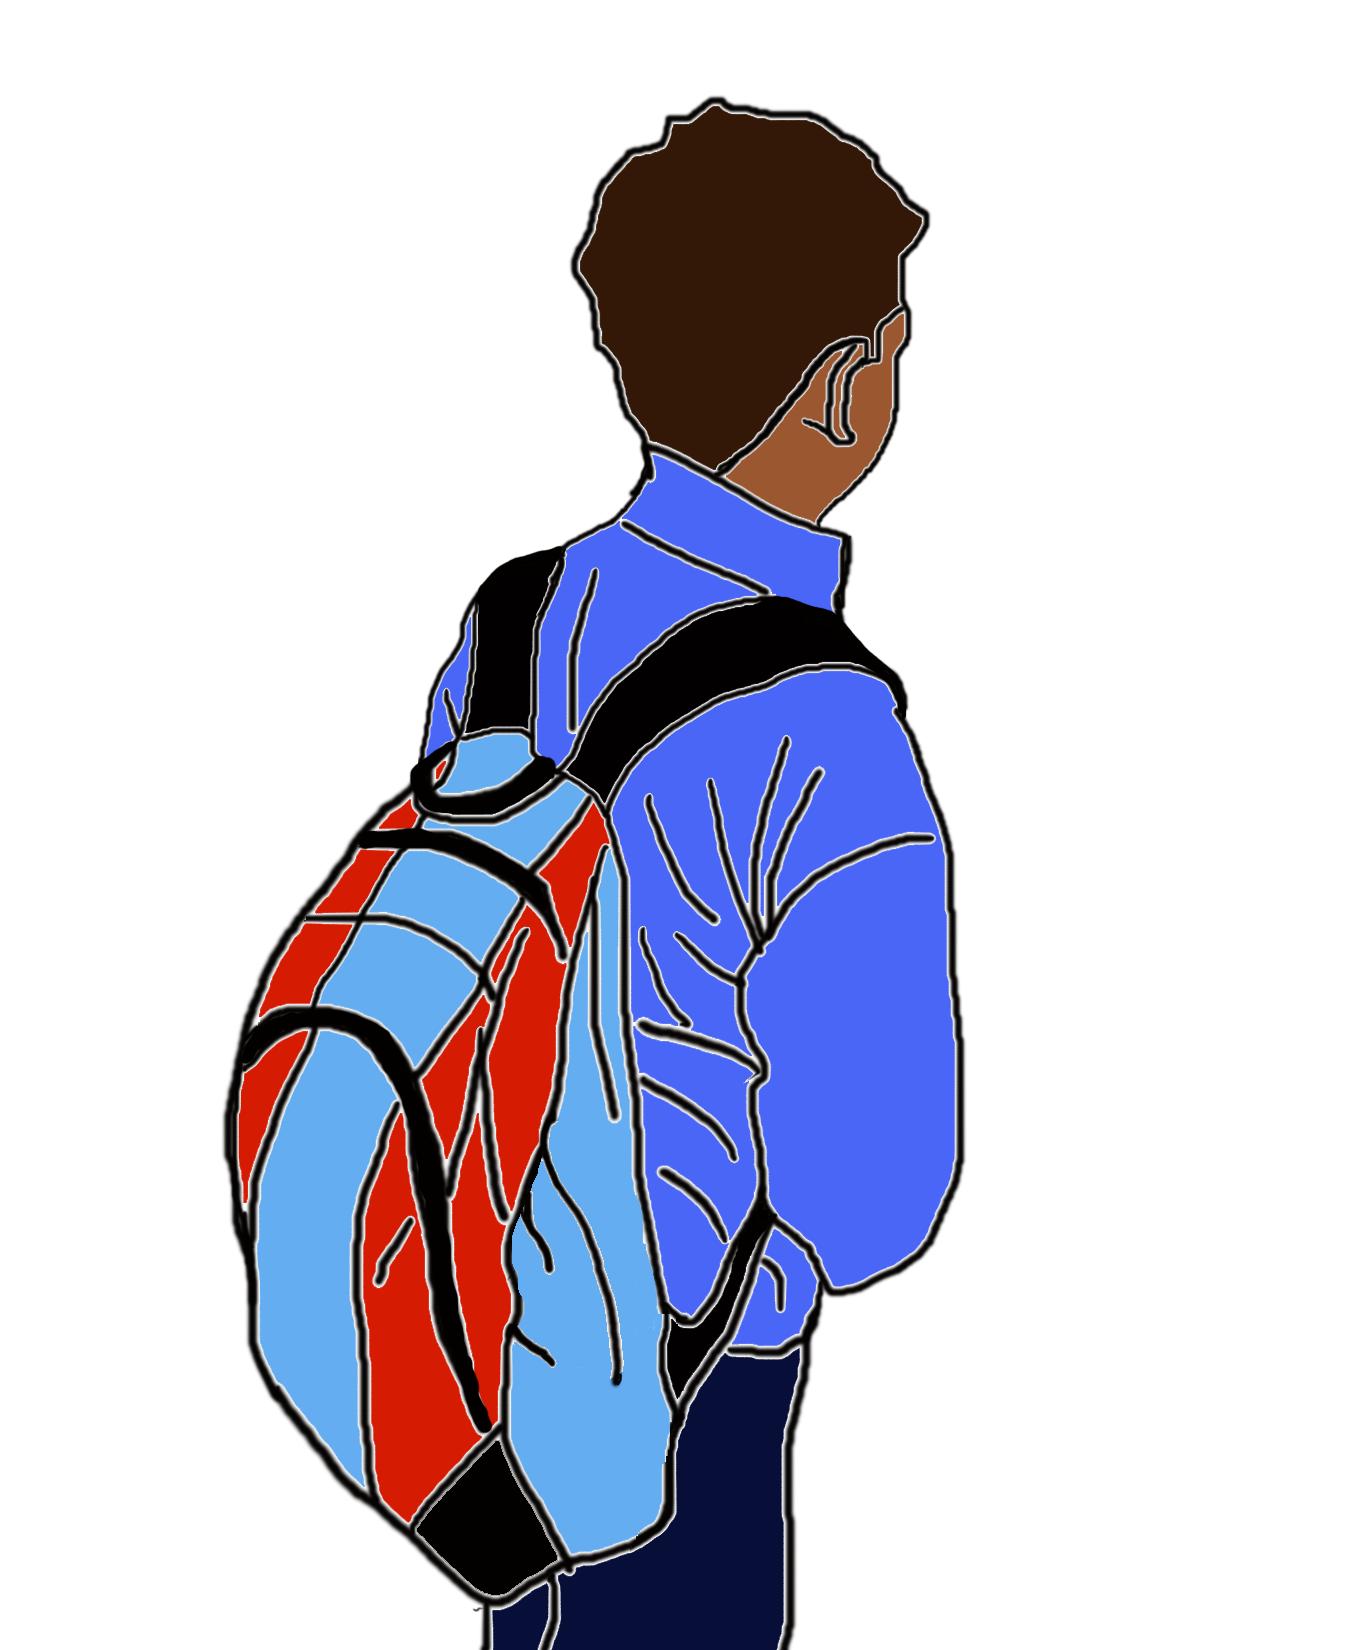 backpackkid